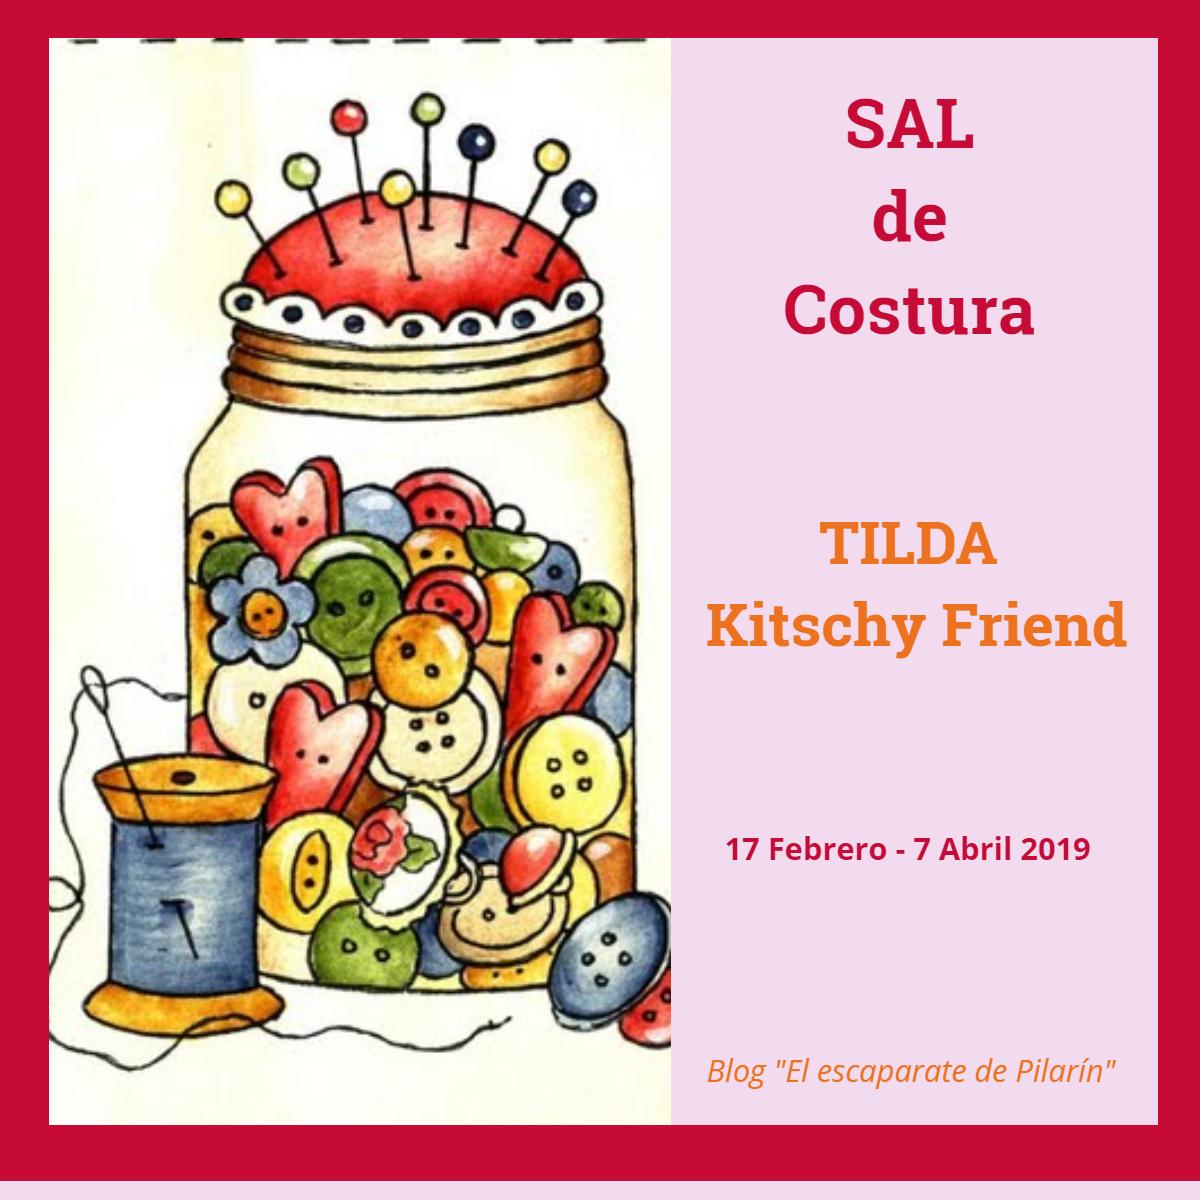 SAL de COSTURA - TILDA Kitschy Friend